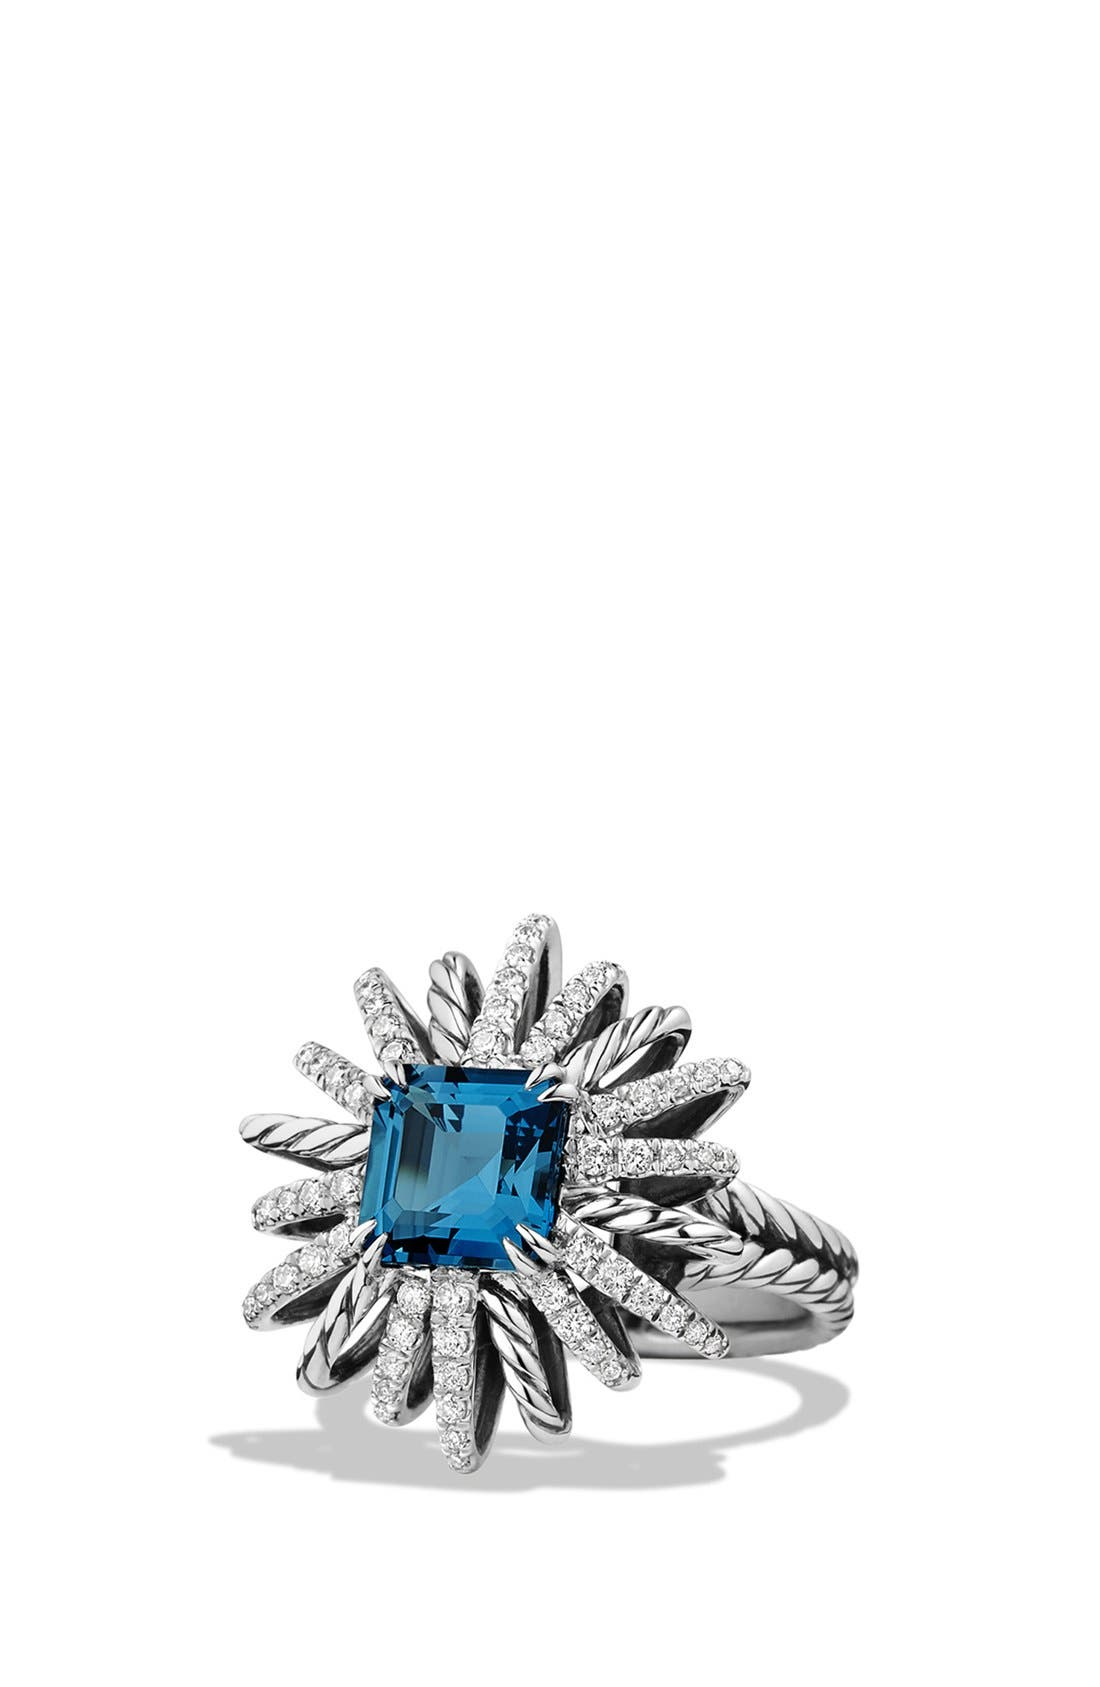 David Yurman 'Starburst' Ring with Diamonds in Silver